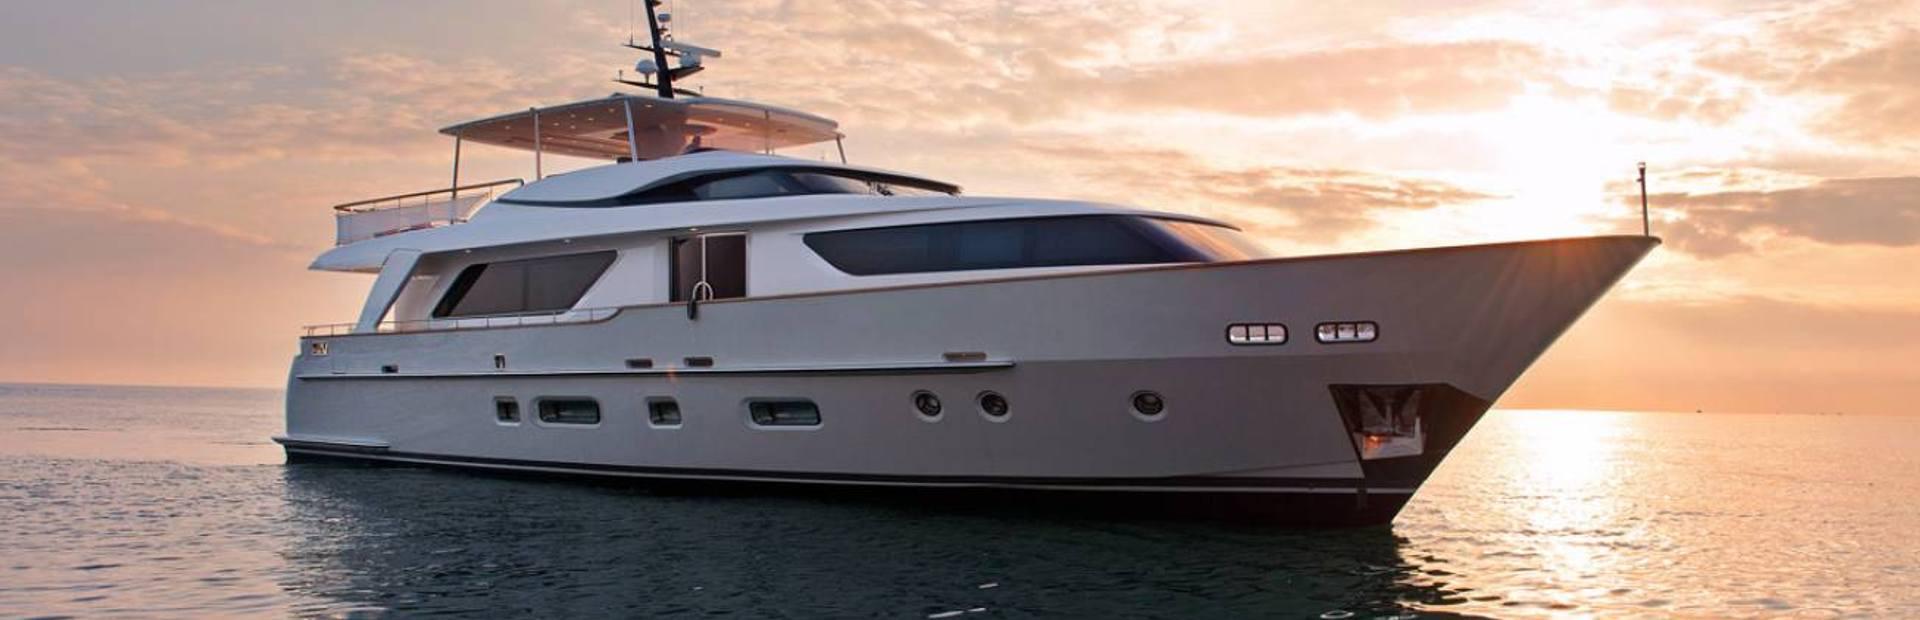 SD92 Yacht Charter